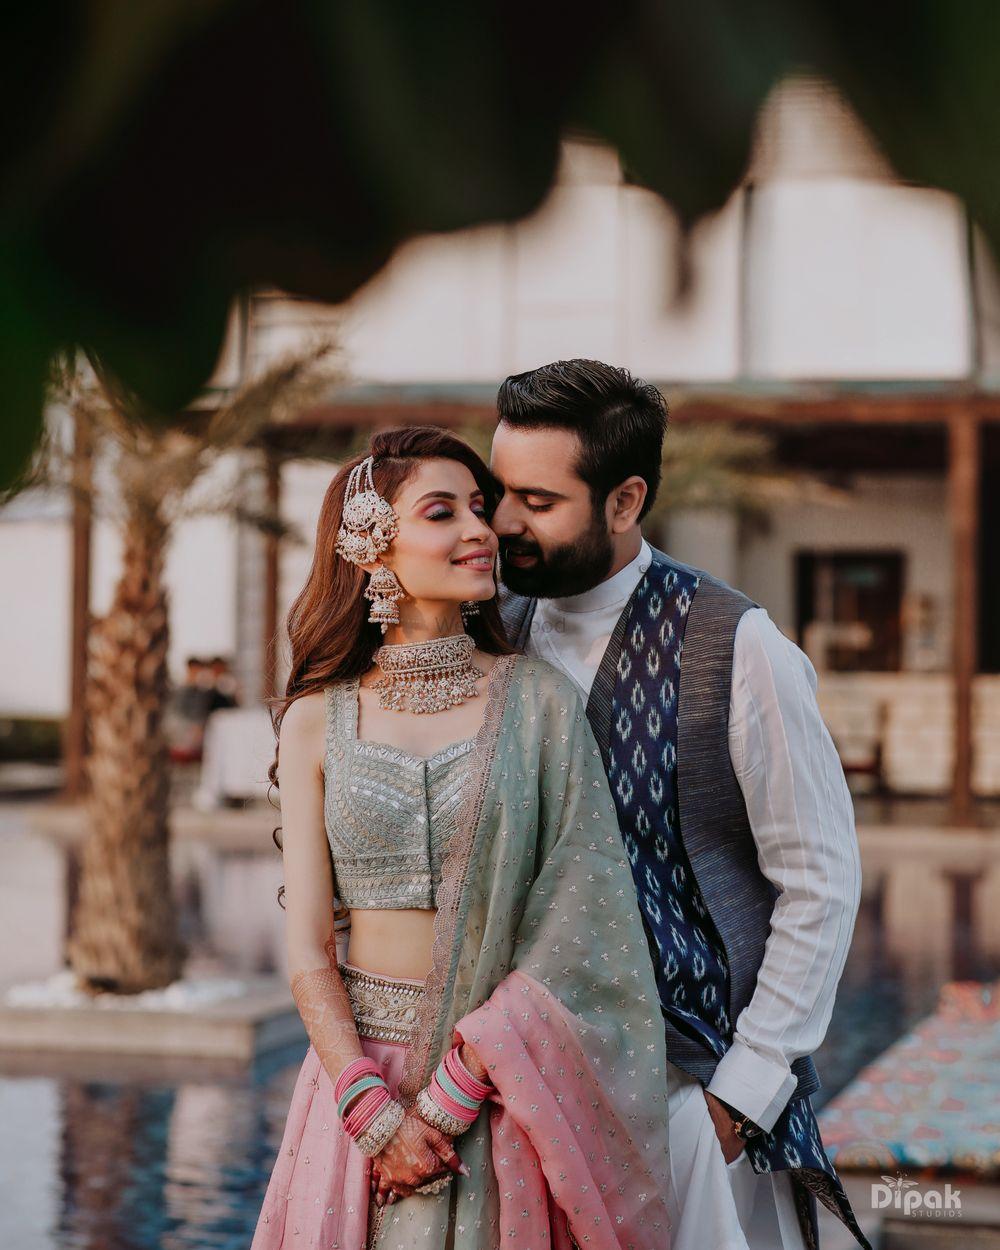 Photo From mehandi shots 2020 - By Dipak Studios